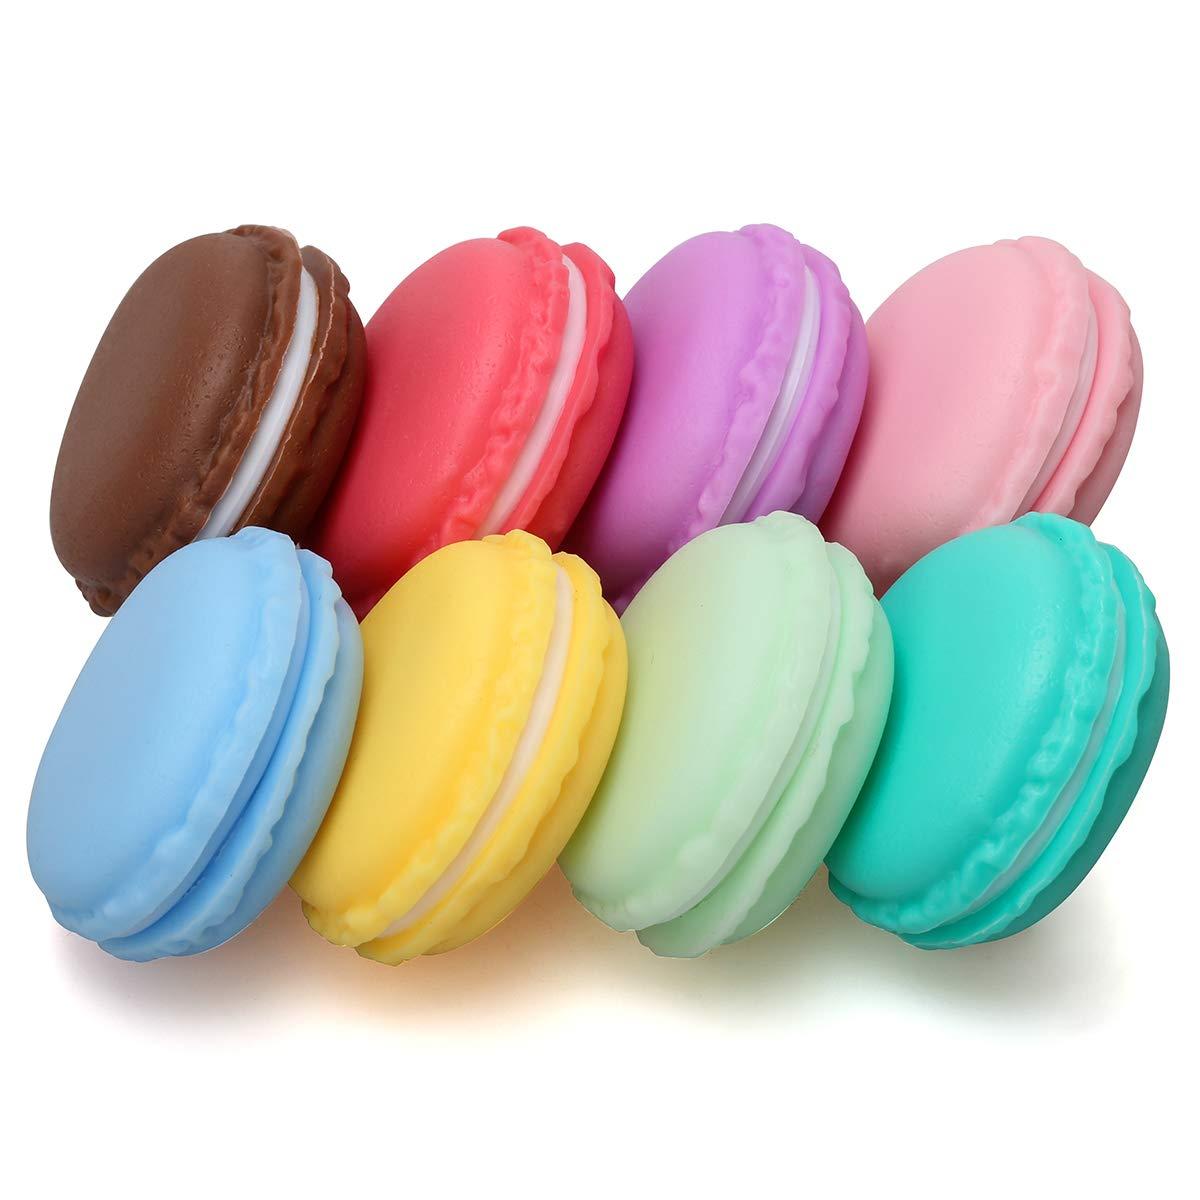 Coolrunner Macaron Case, Mini Macaron Box, Macaron Jewelry Box, Macaron Cute Pill Box, Colorful Macaron Jewelry Storage Box, Shape Storage Box Candy Cute Pill Organizer Case Container(8PCS)